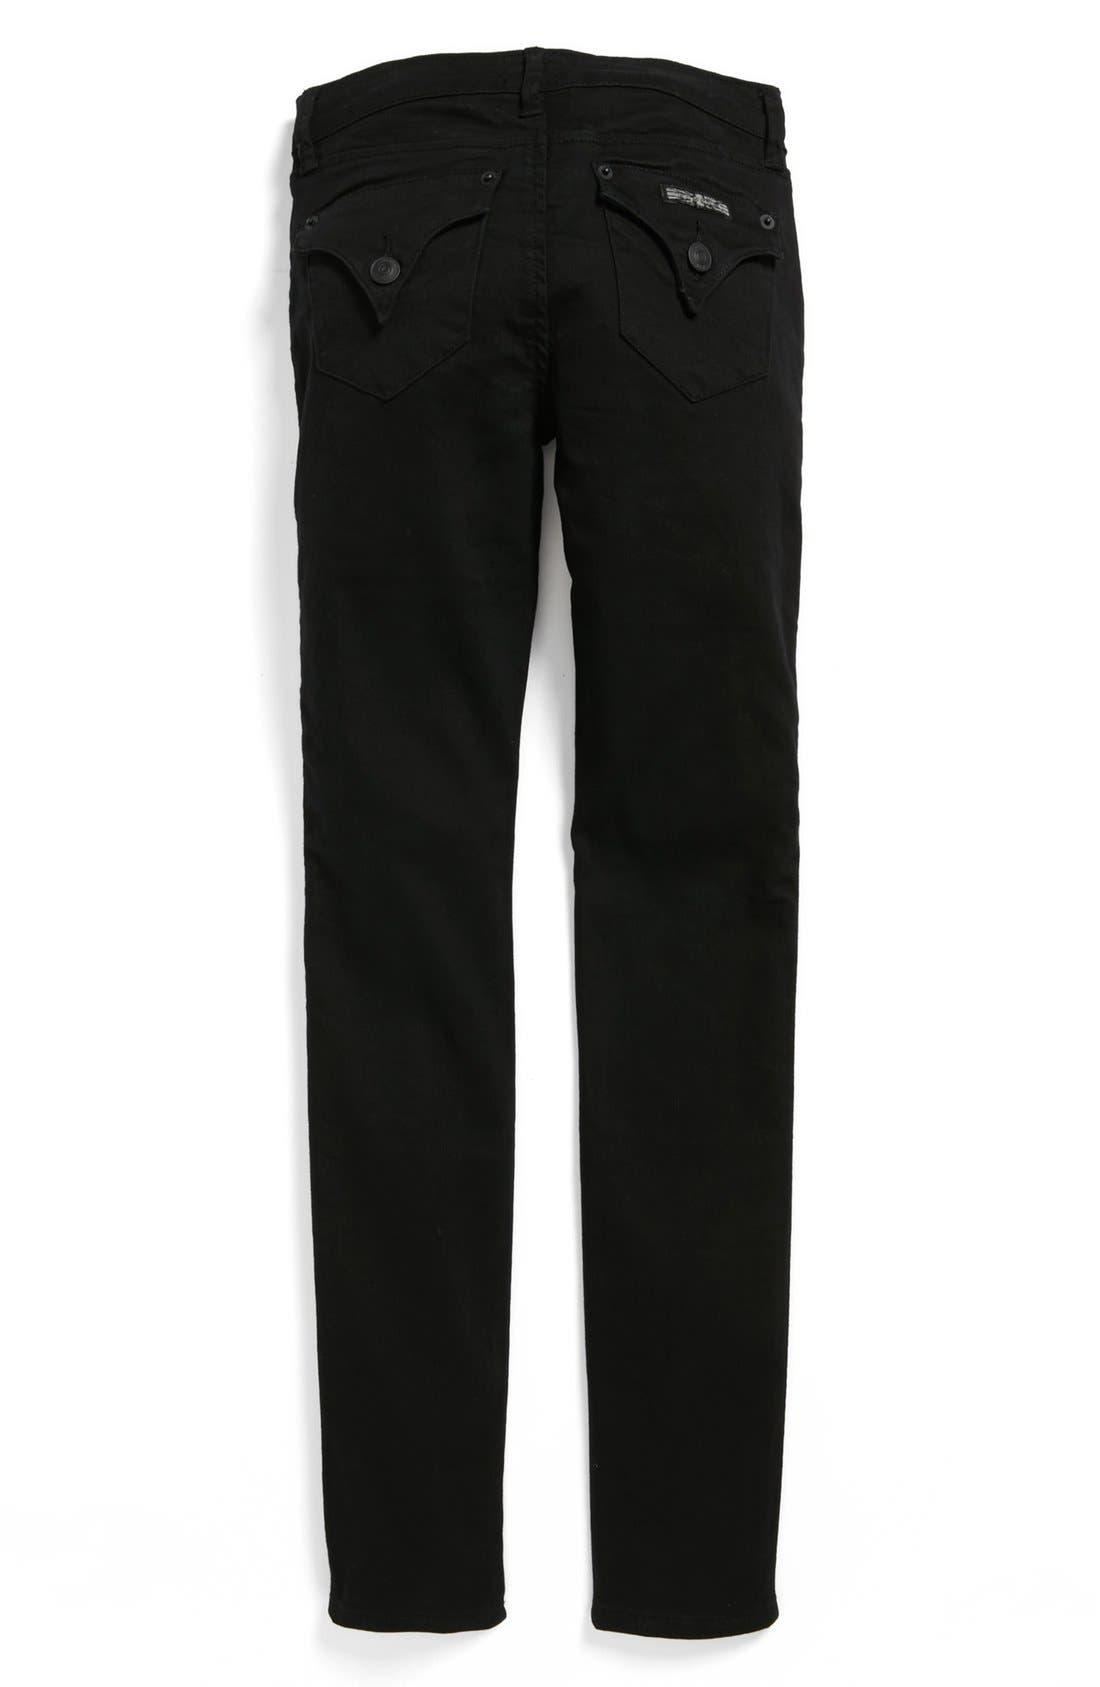 Alternate Image 2  - Hudson Kids 'Collin' Skinny Jeans (Vice Versa) (Big Girls)